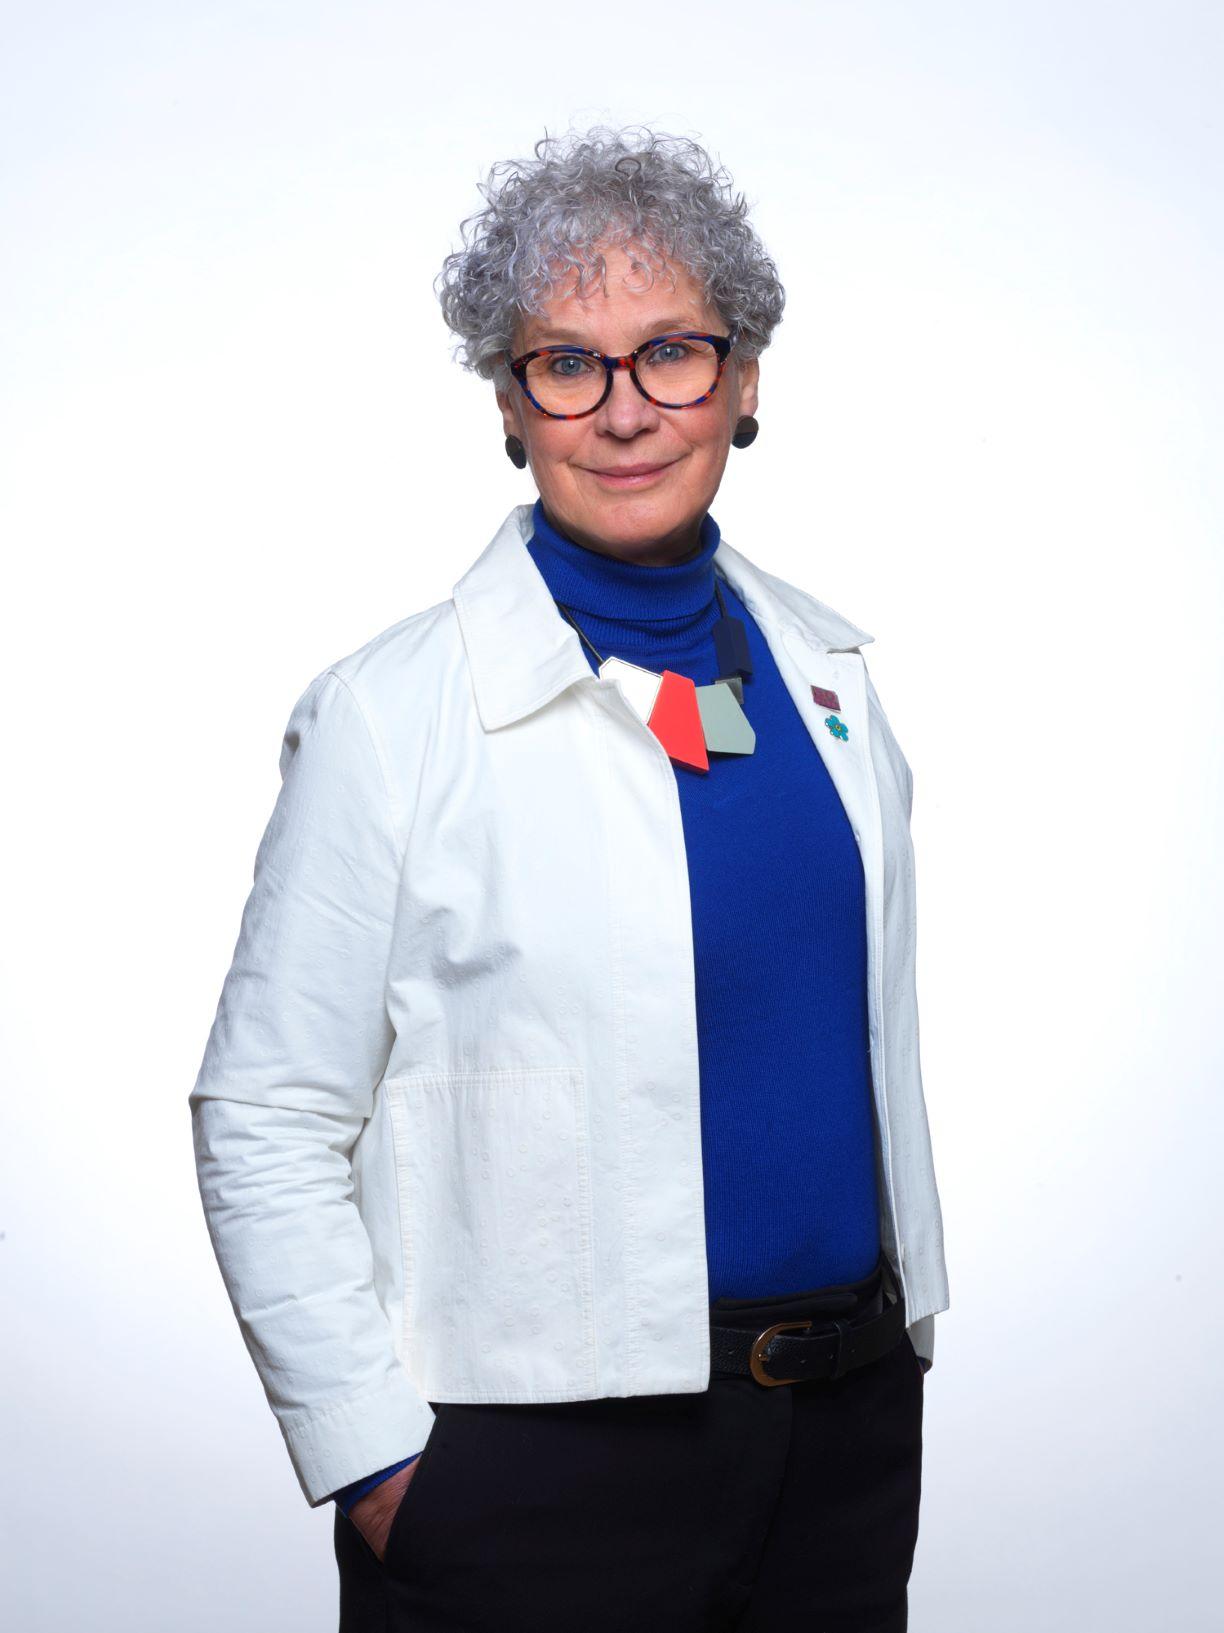 Kandidaat Tweede Kamer 50PLUS: Ellen Verkoelen - Foto: Patricia Steur